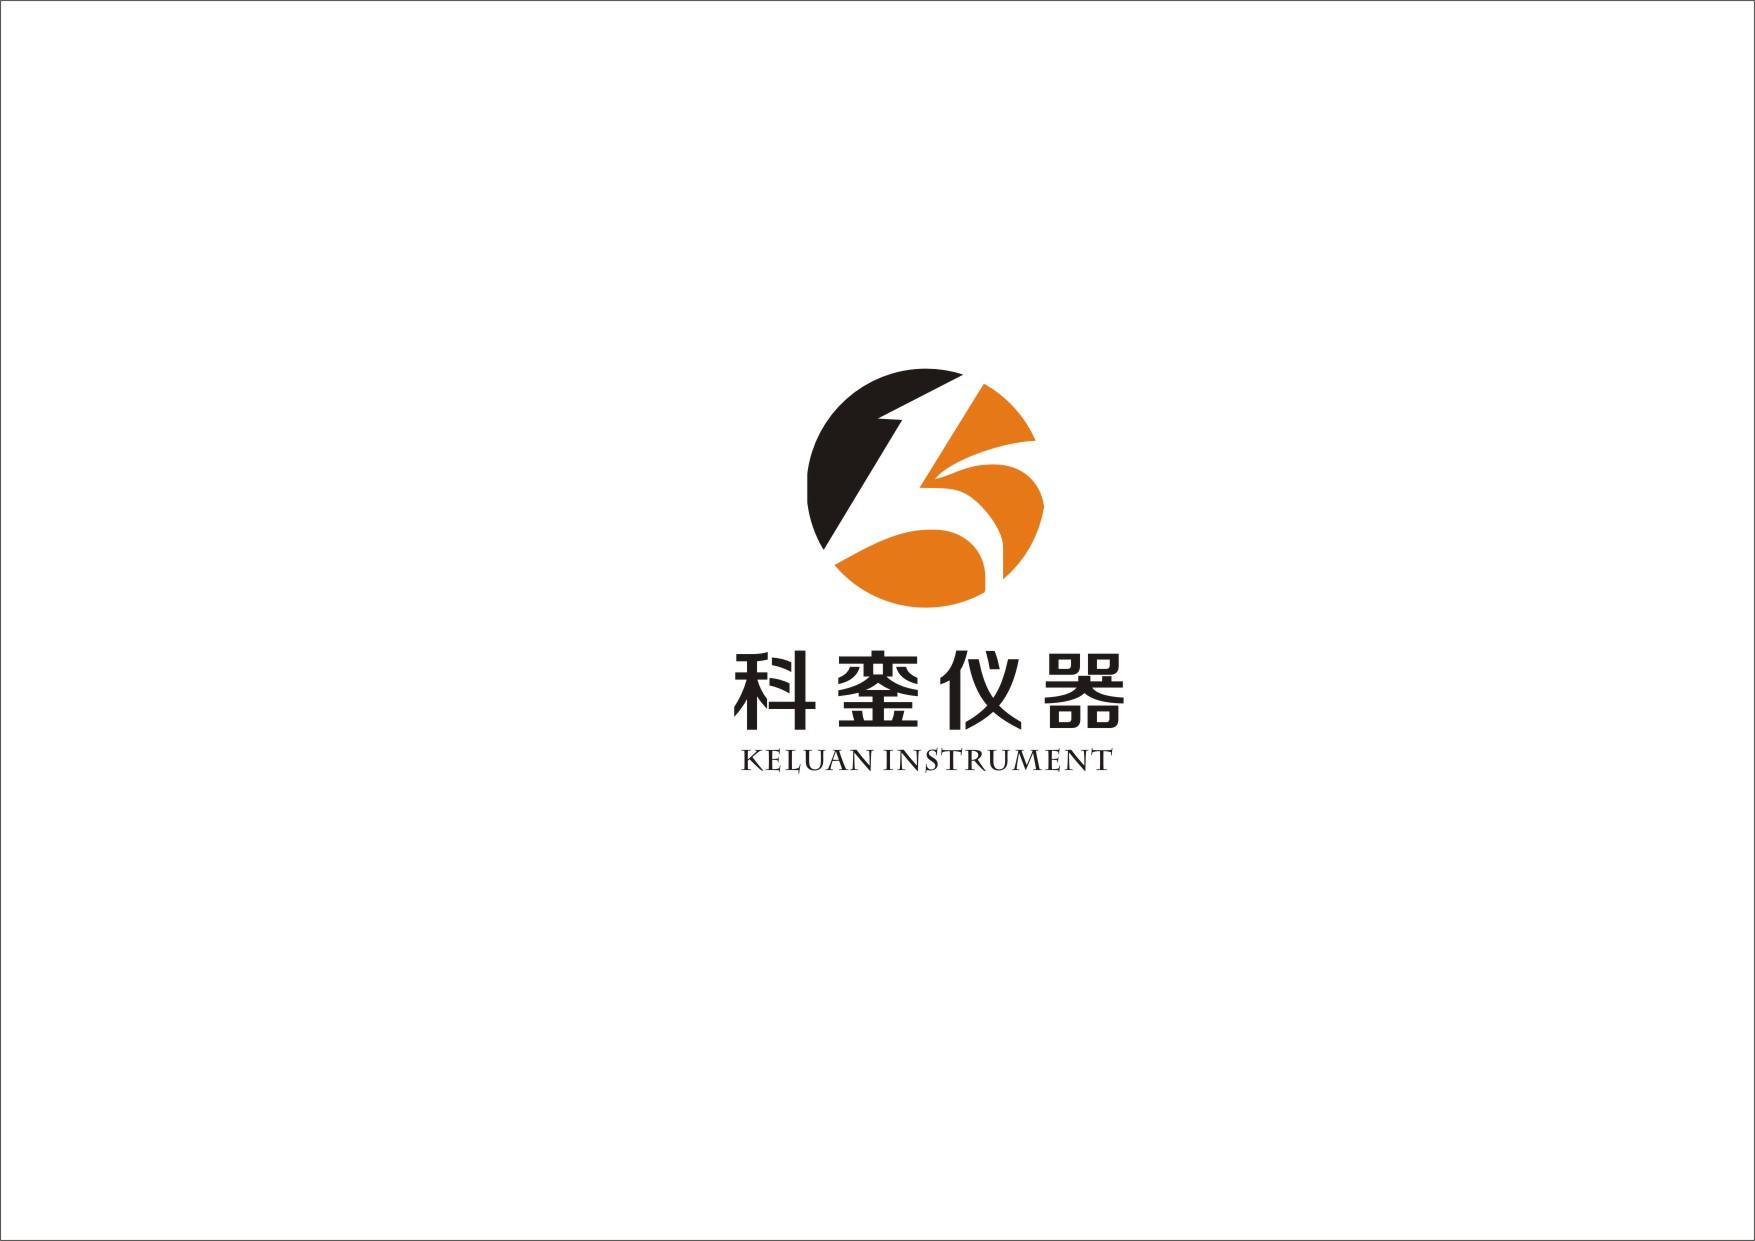 logo logo 标志 设计 图标 1755_1241